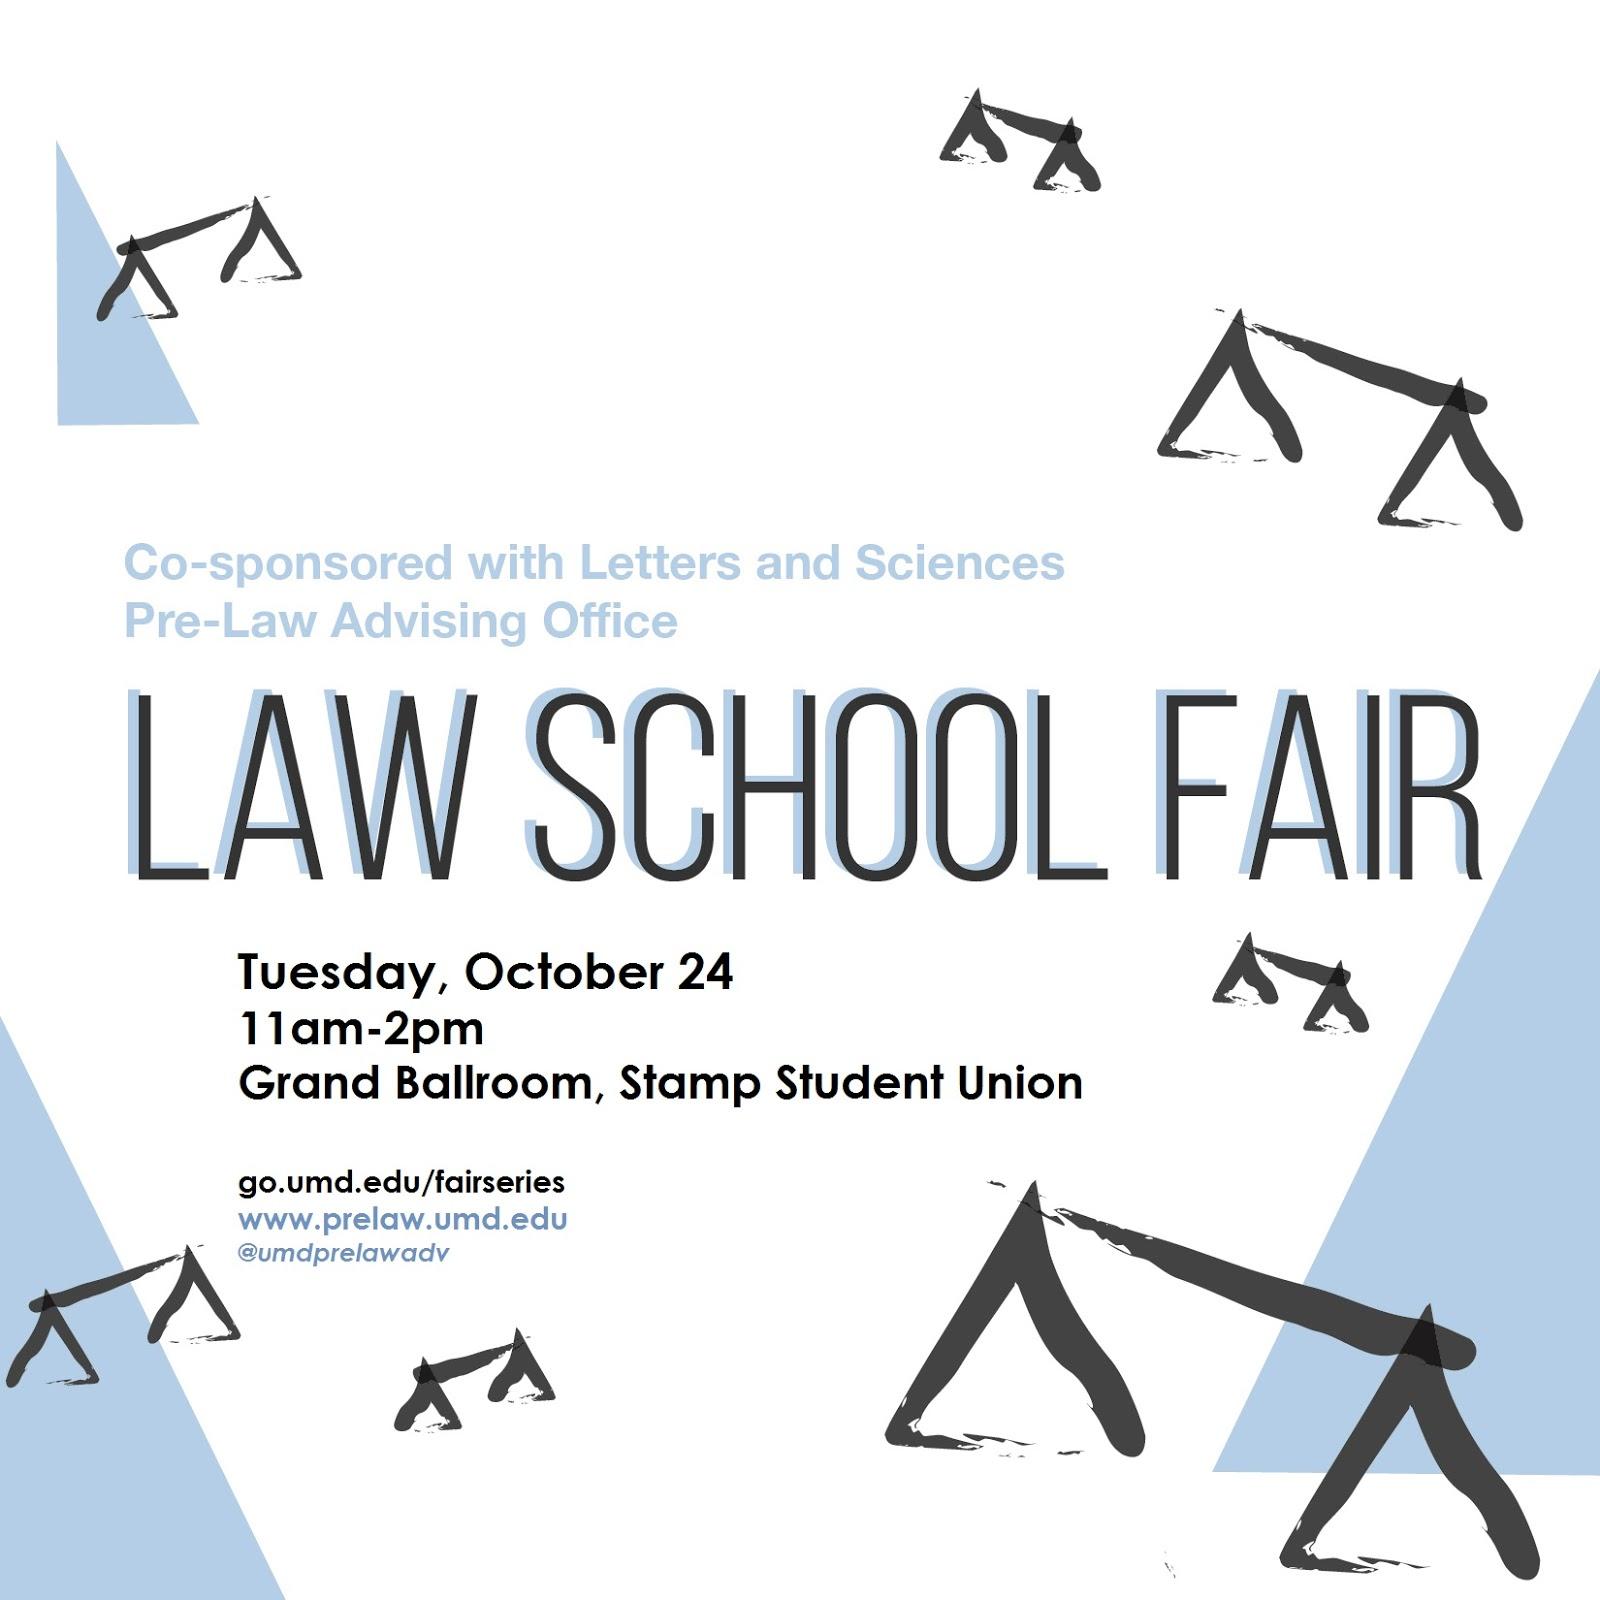 law school fair